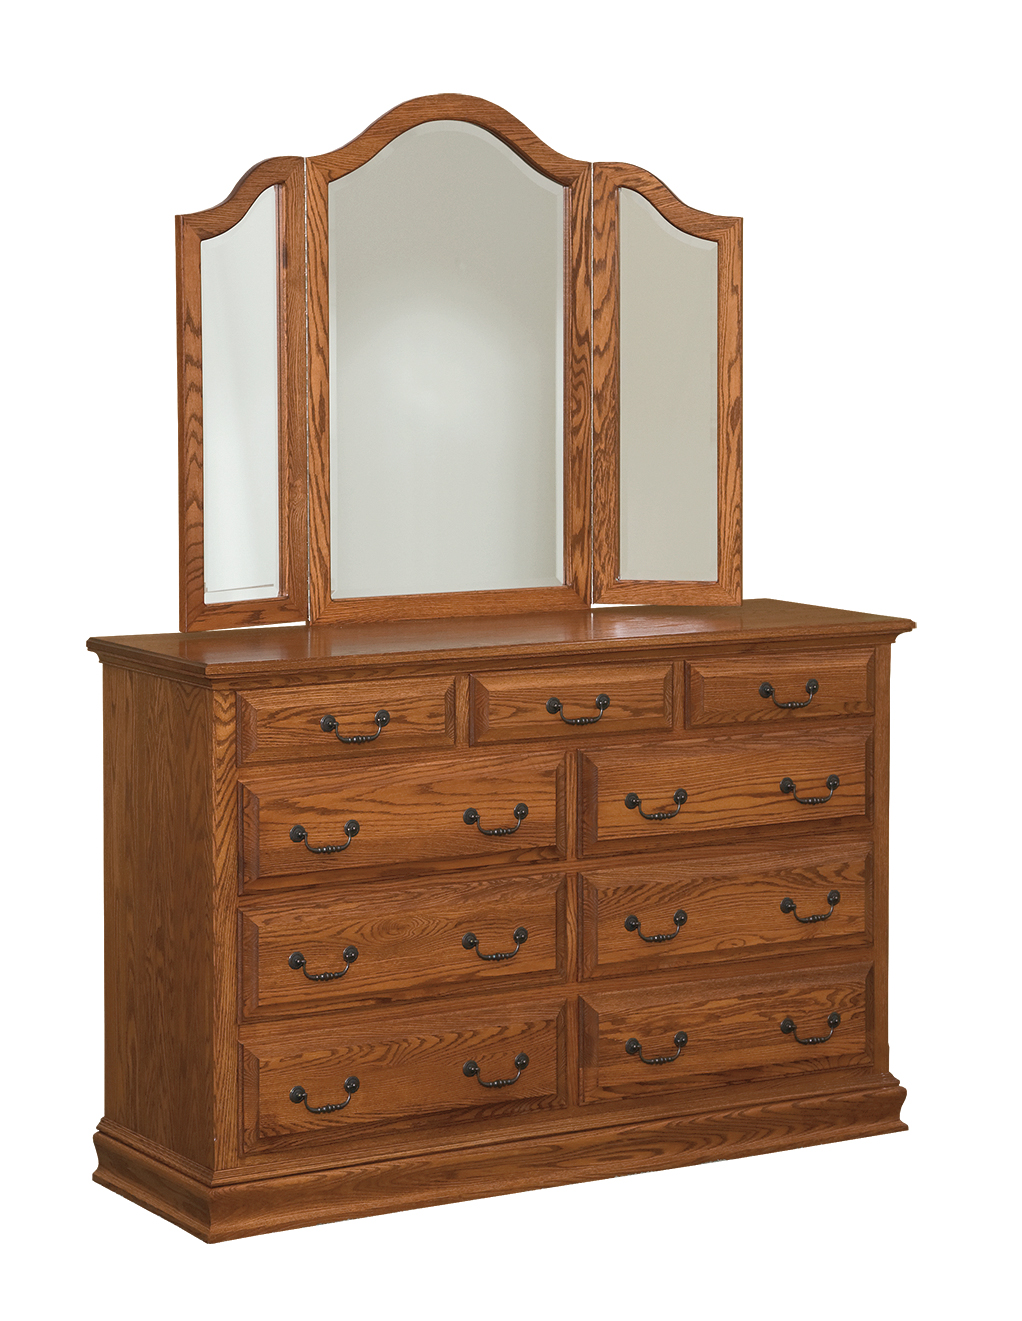 187236-301RO-mule chest + 783-mirror.jpg